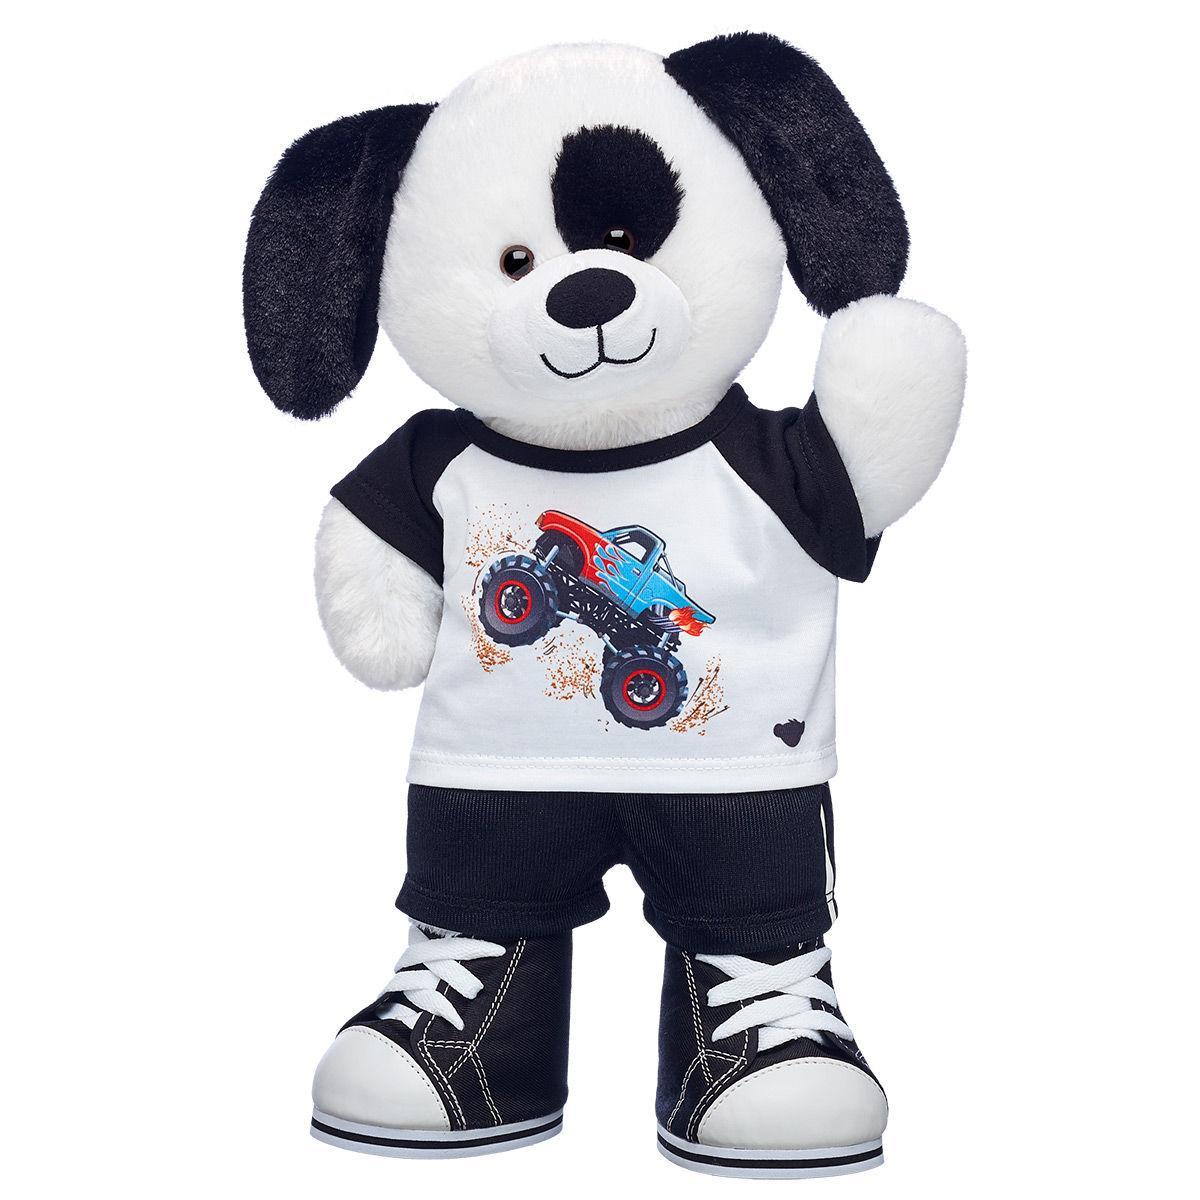 Build-A-Bear Puppy.jpg